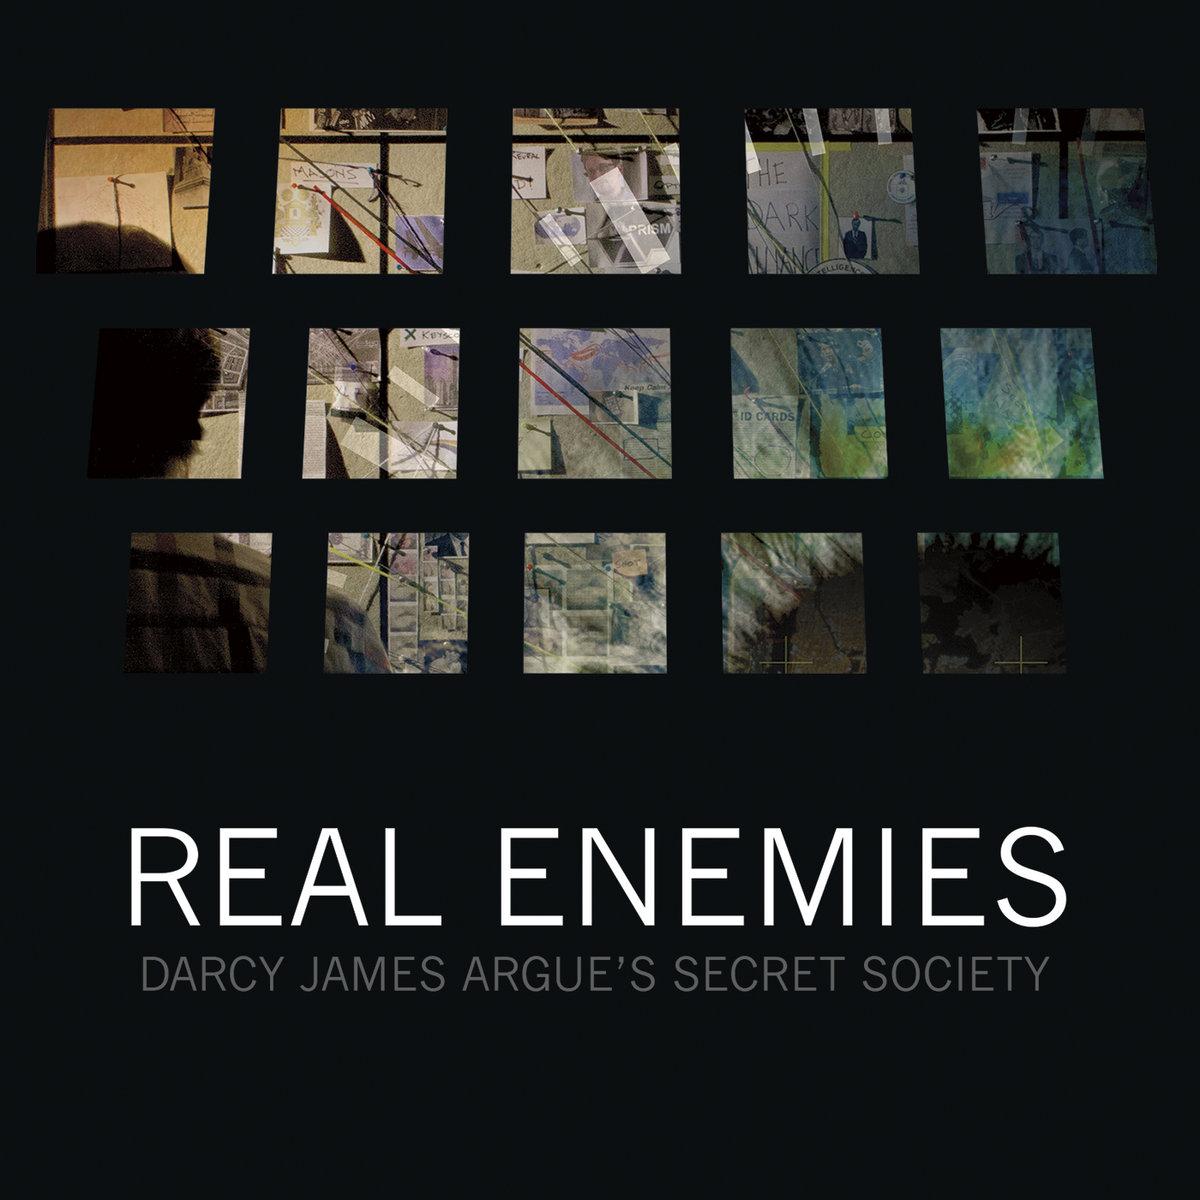 Real Enemies   Darcy James Argue's Secret Society